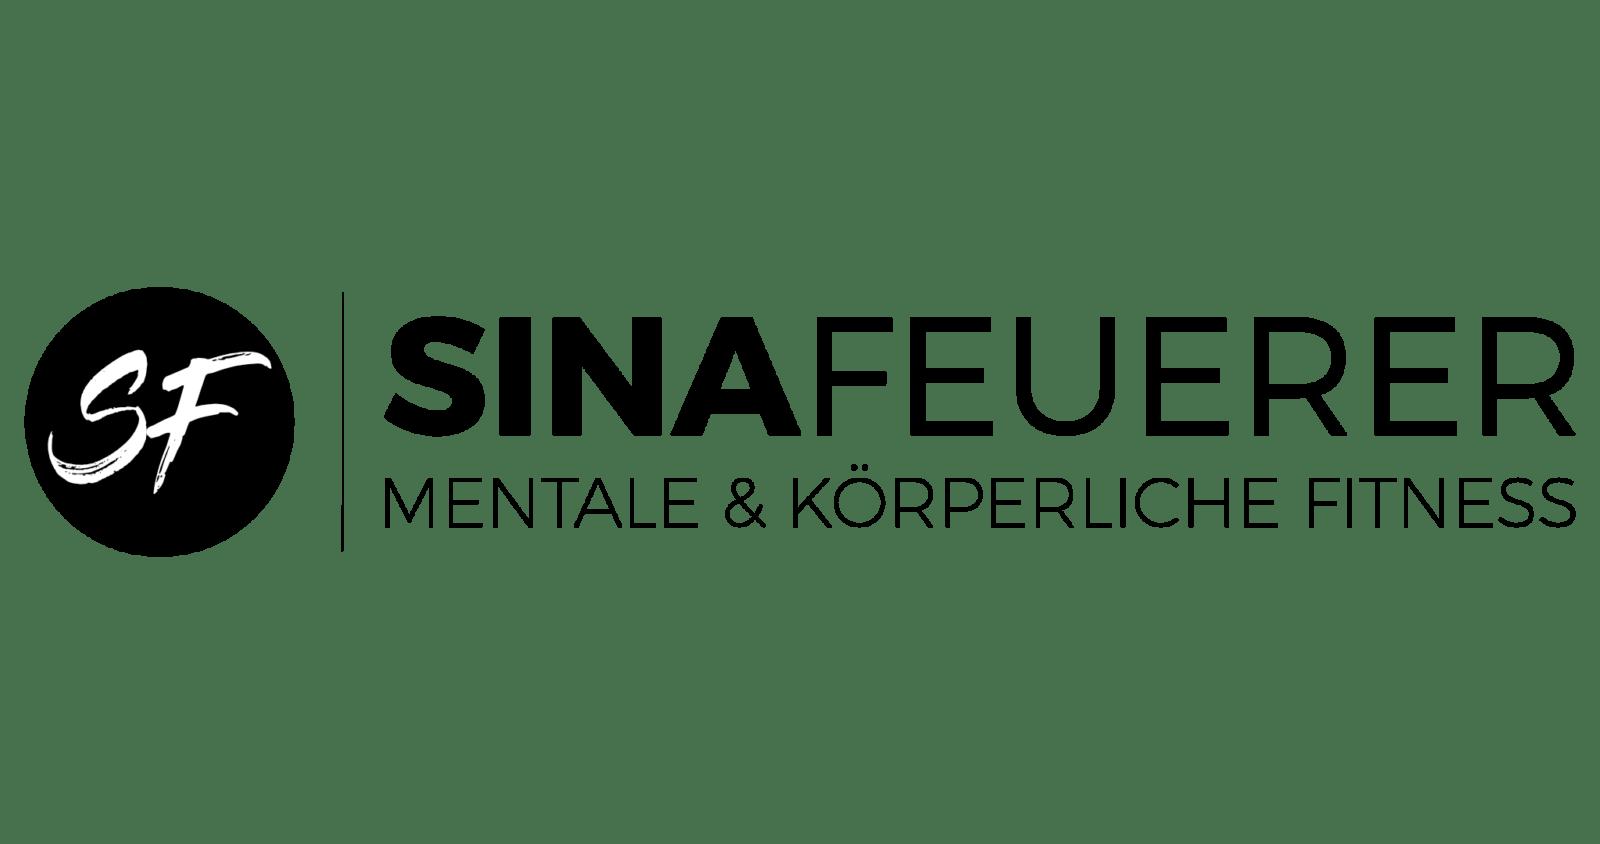 Sina Feuerer